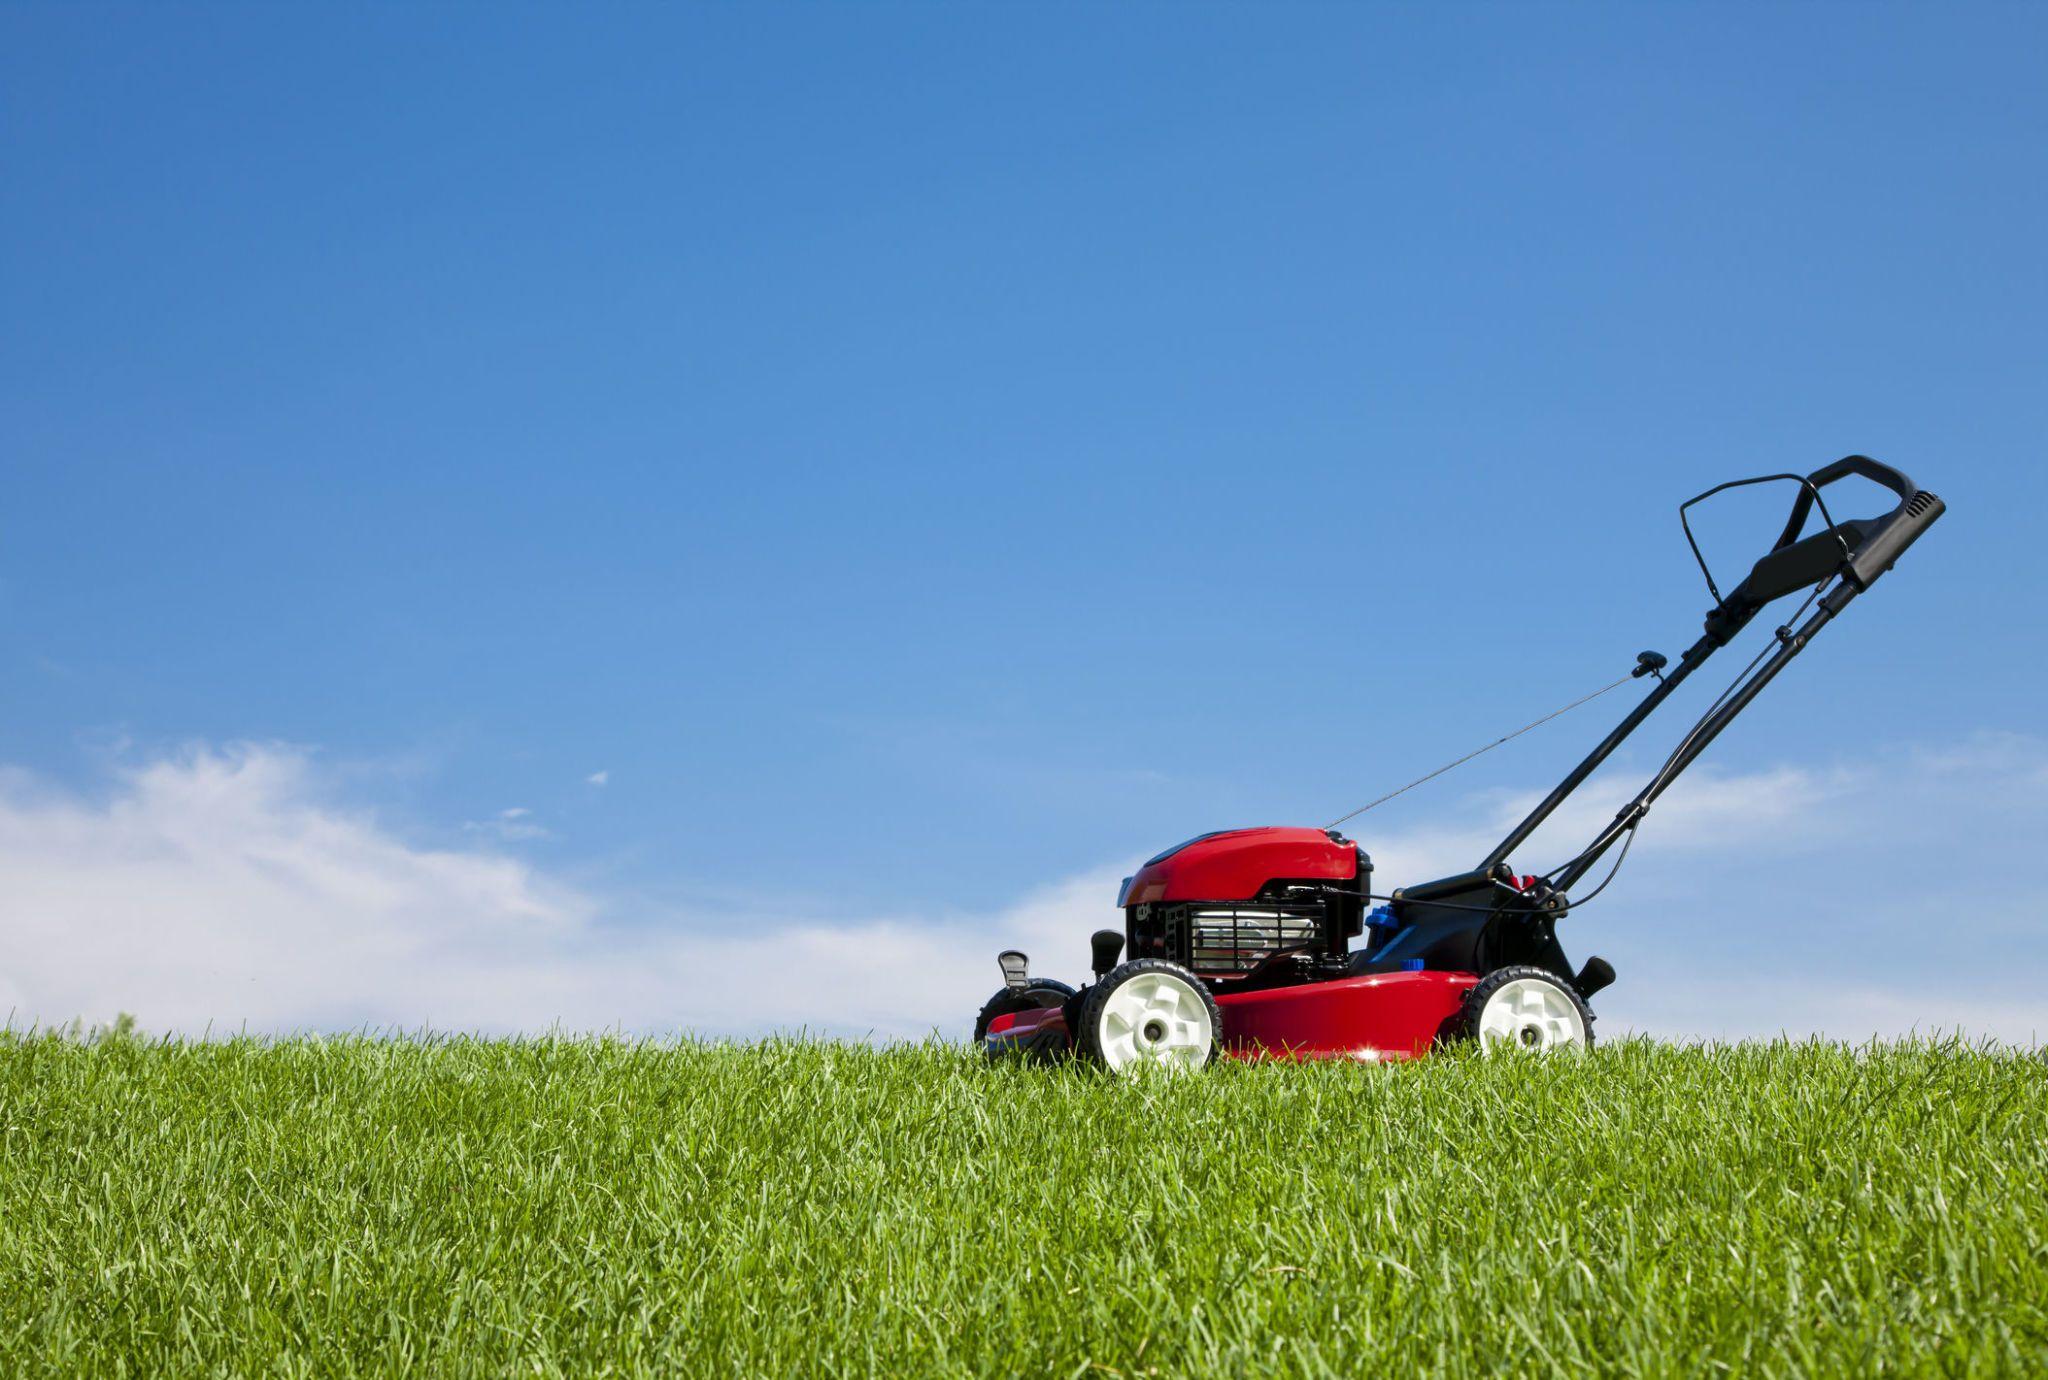 Kobalt Electric Lawn Mower Manual